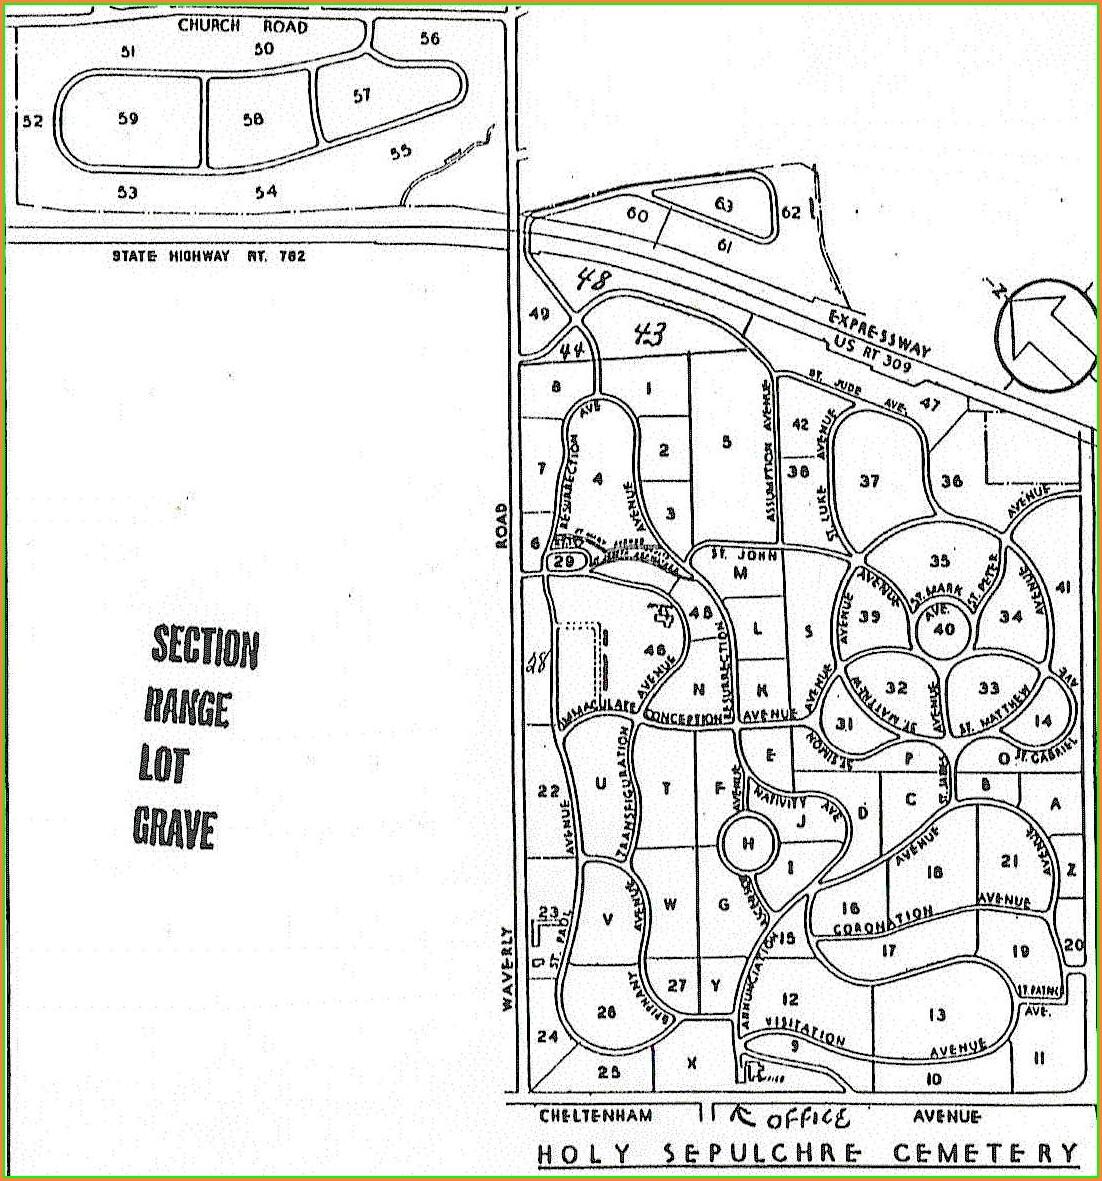 Holy Sepulchre Cemetery Cheltenham Map